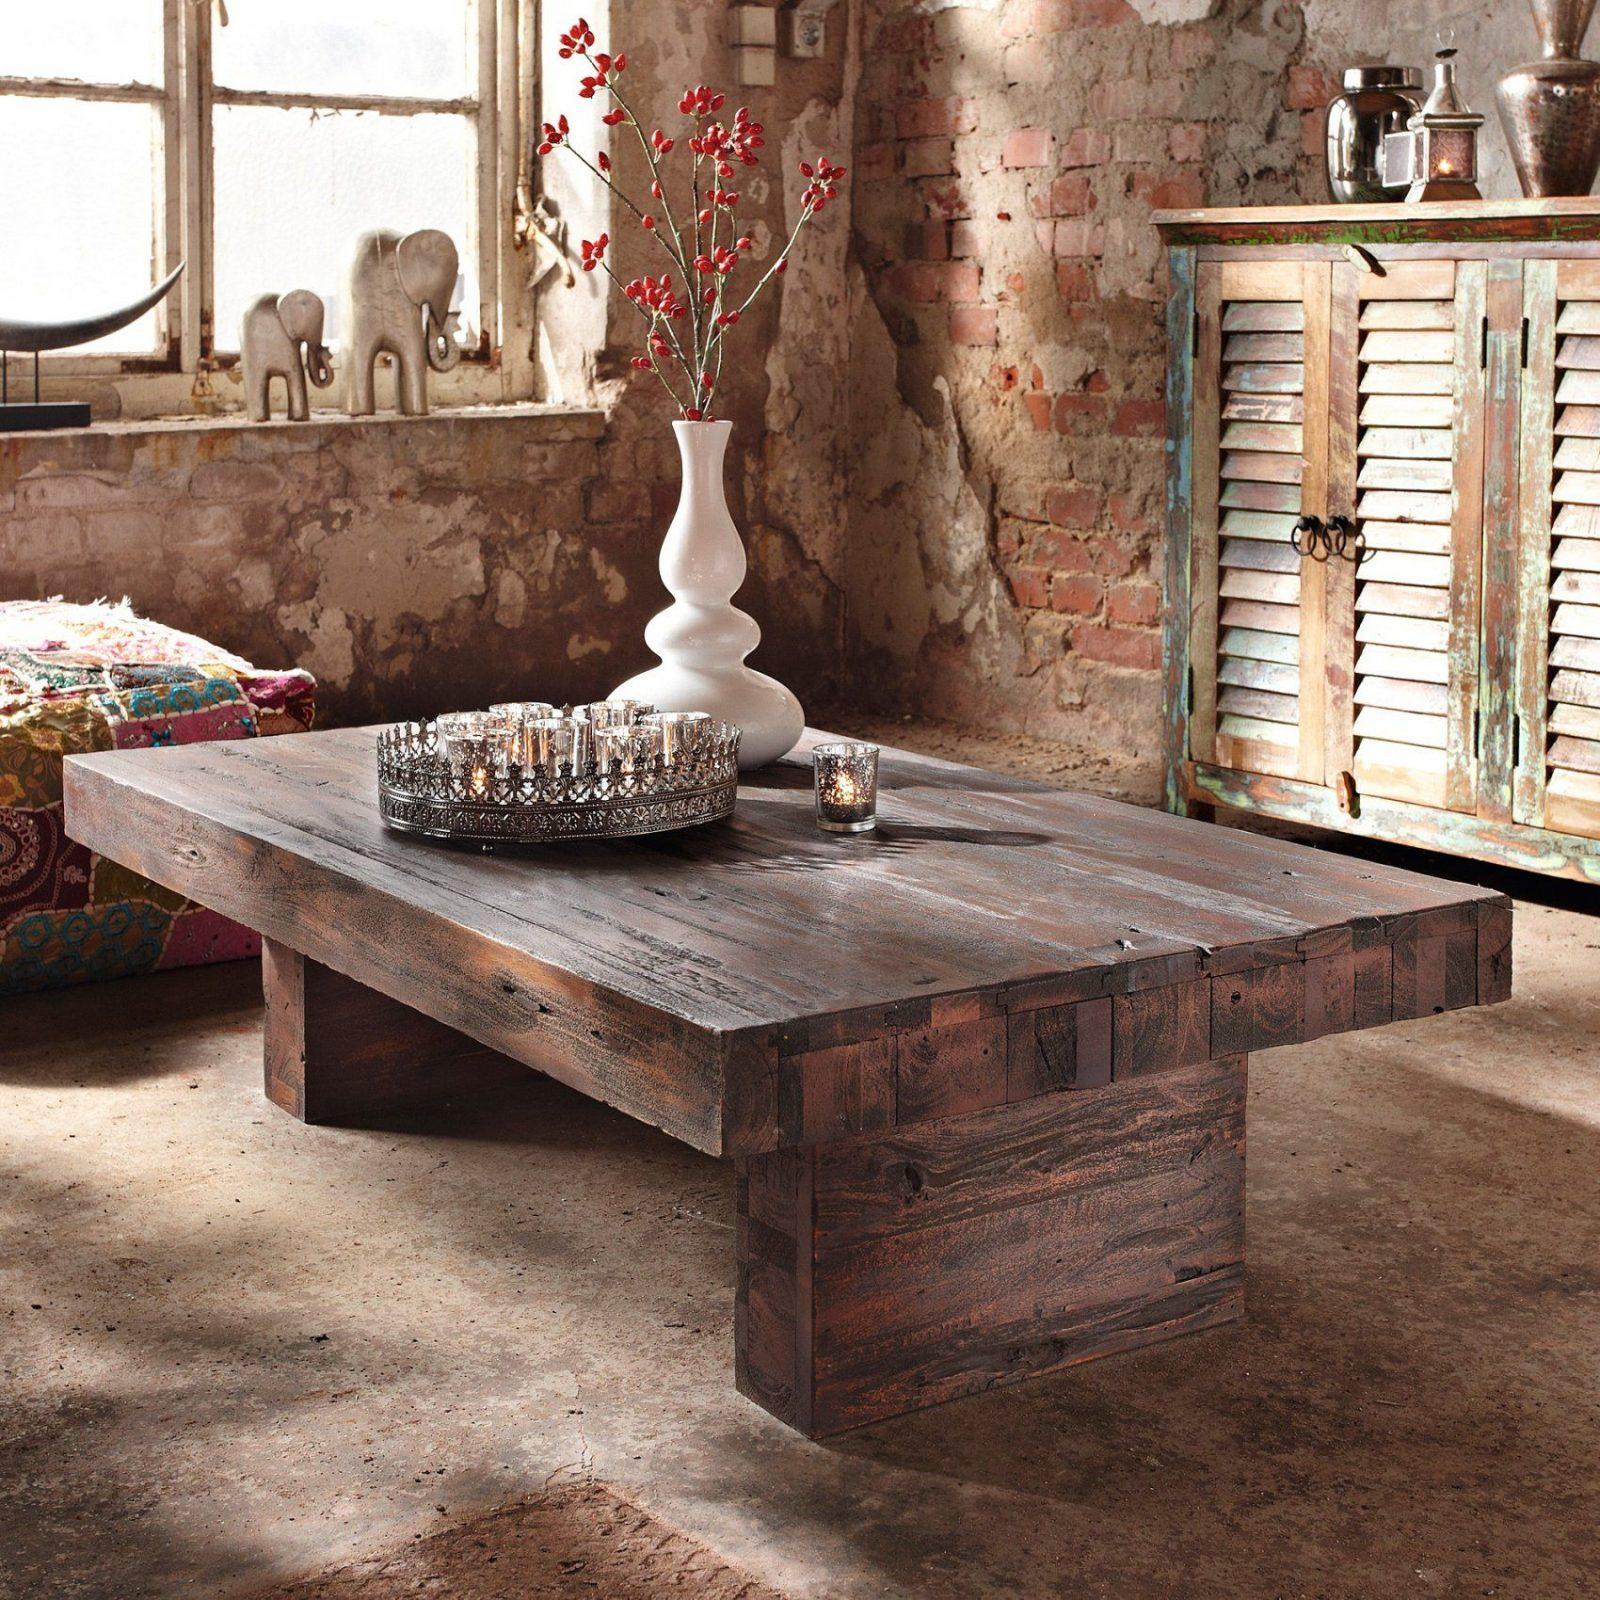 Zauberhaft Rustikaler Couchtisch Holz Vintage Volles Hd Wallpaper von Couchtisch Rustikal Antik Bild